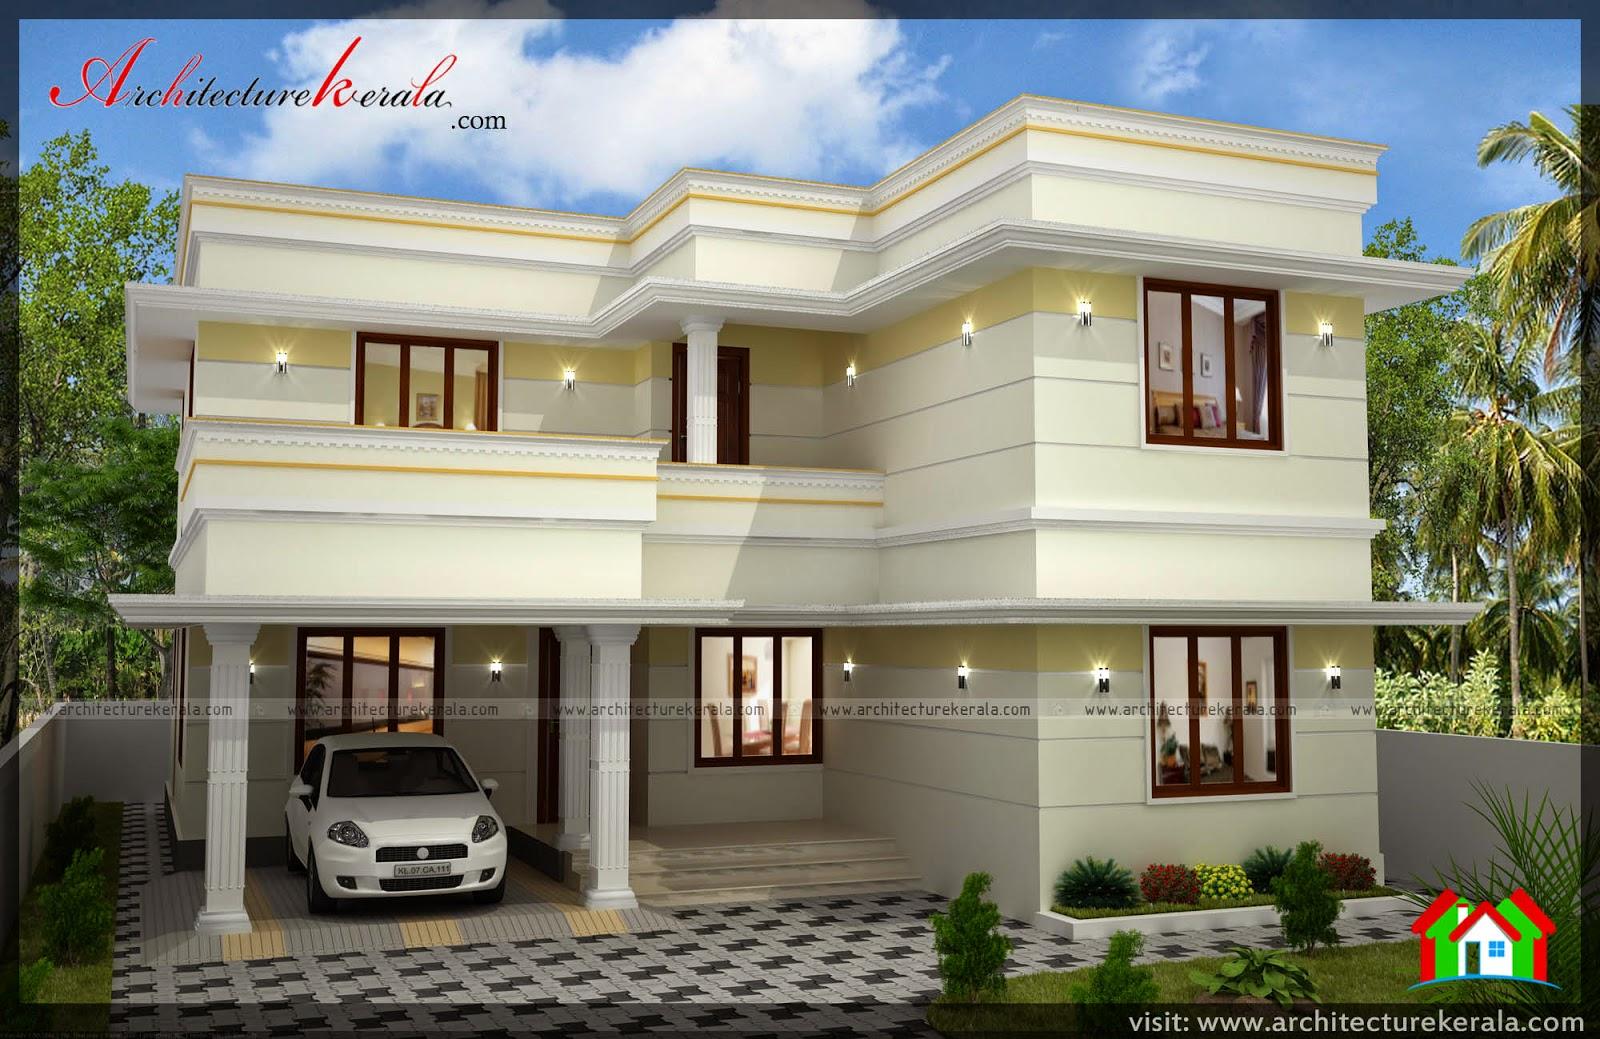 Three bedroom two storey house plan architecture kerala 2 floor home